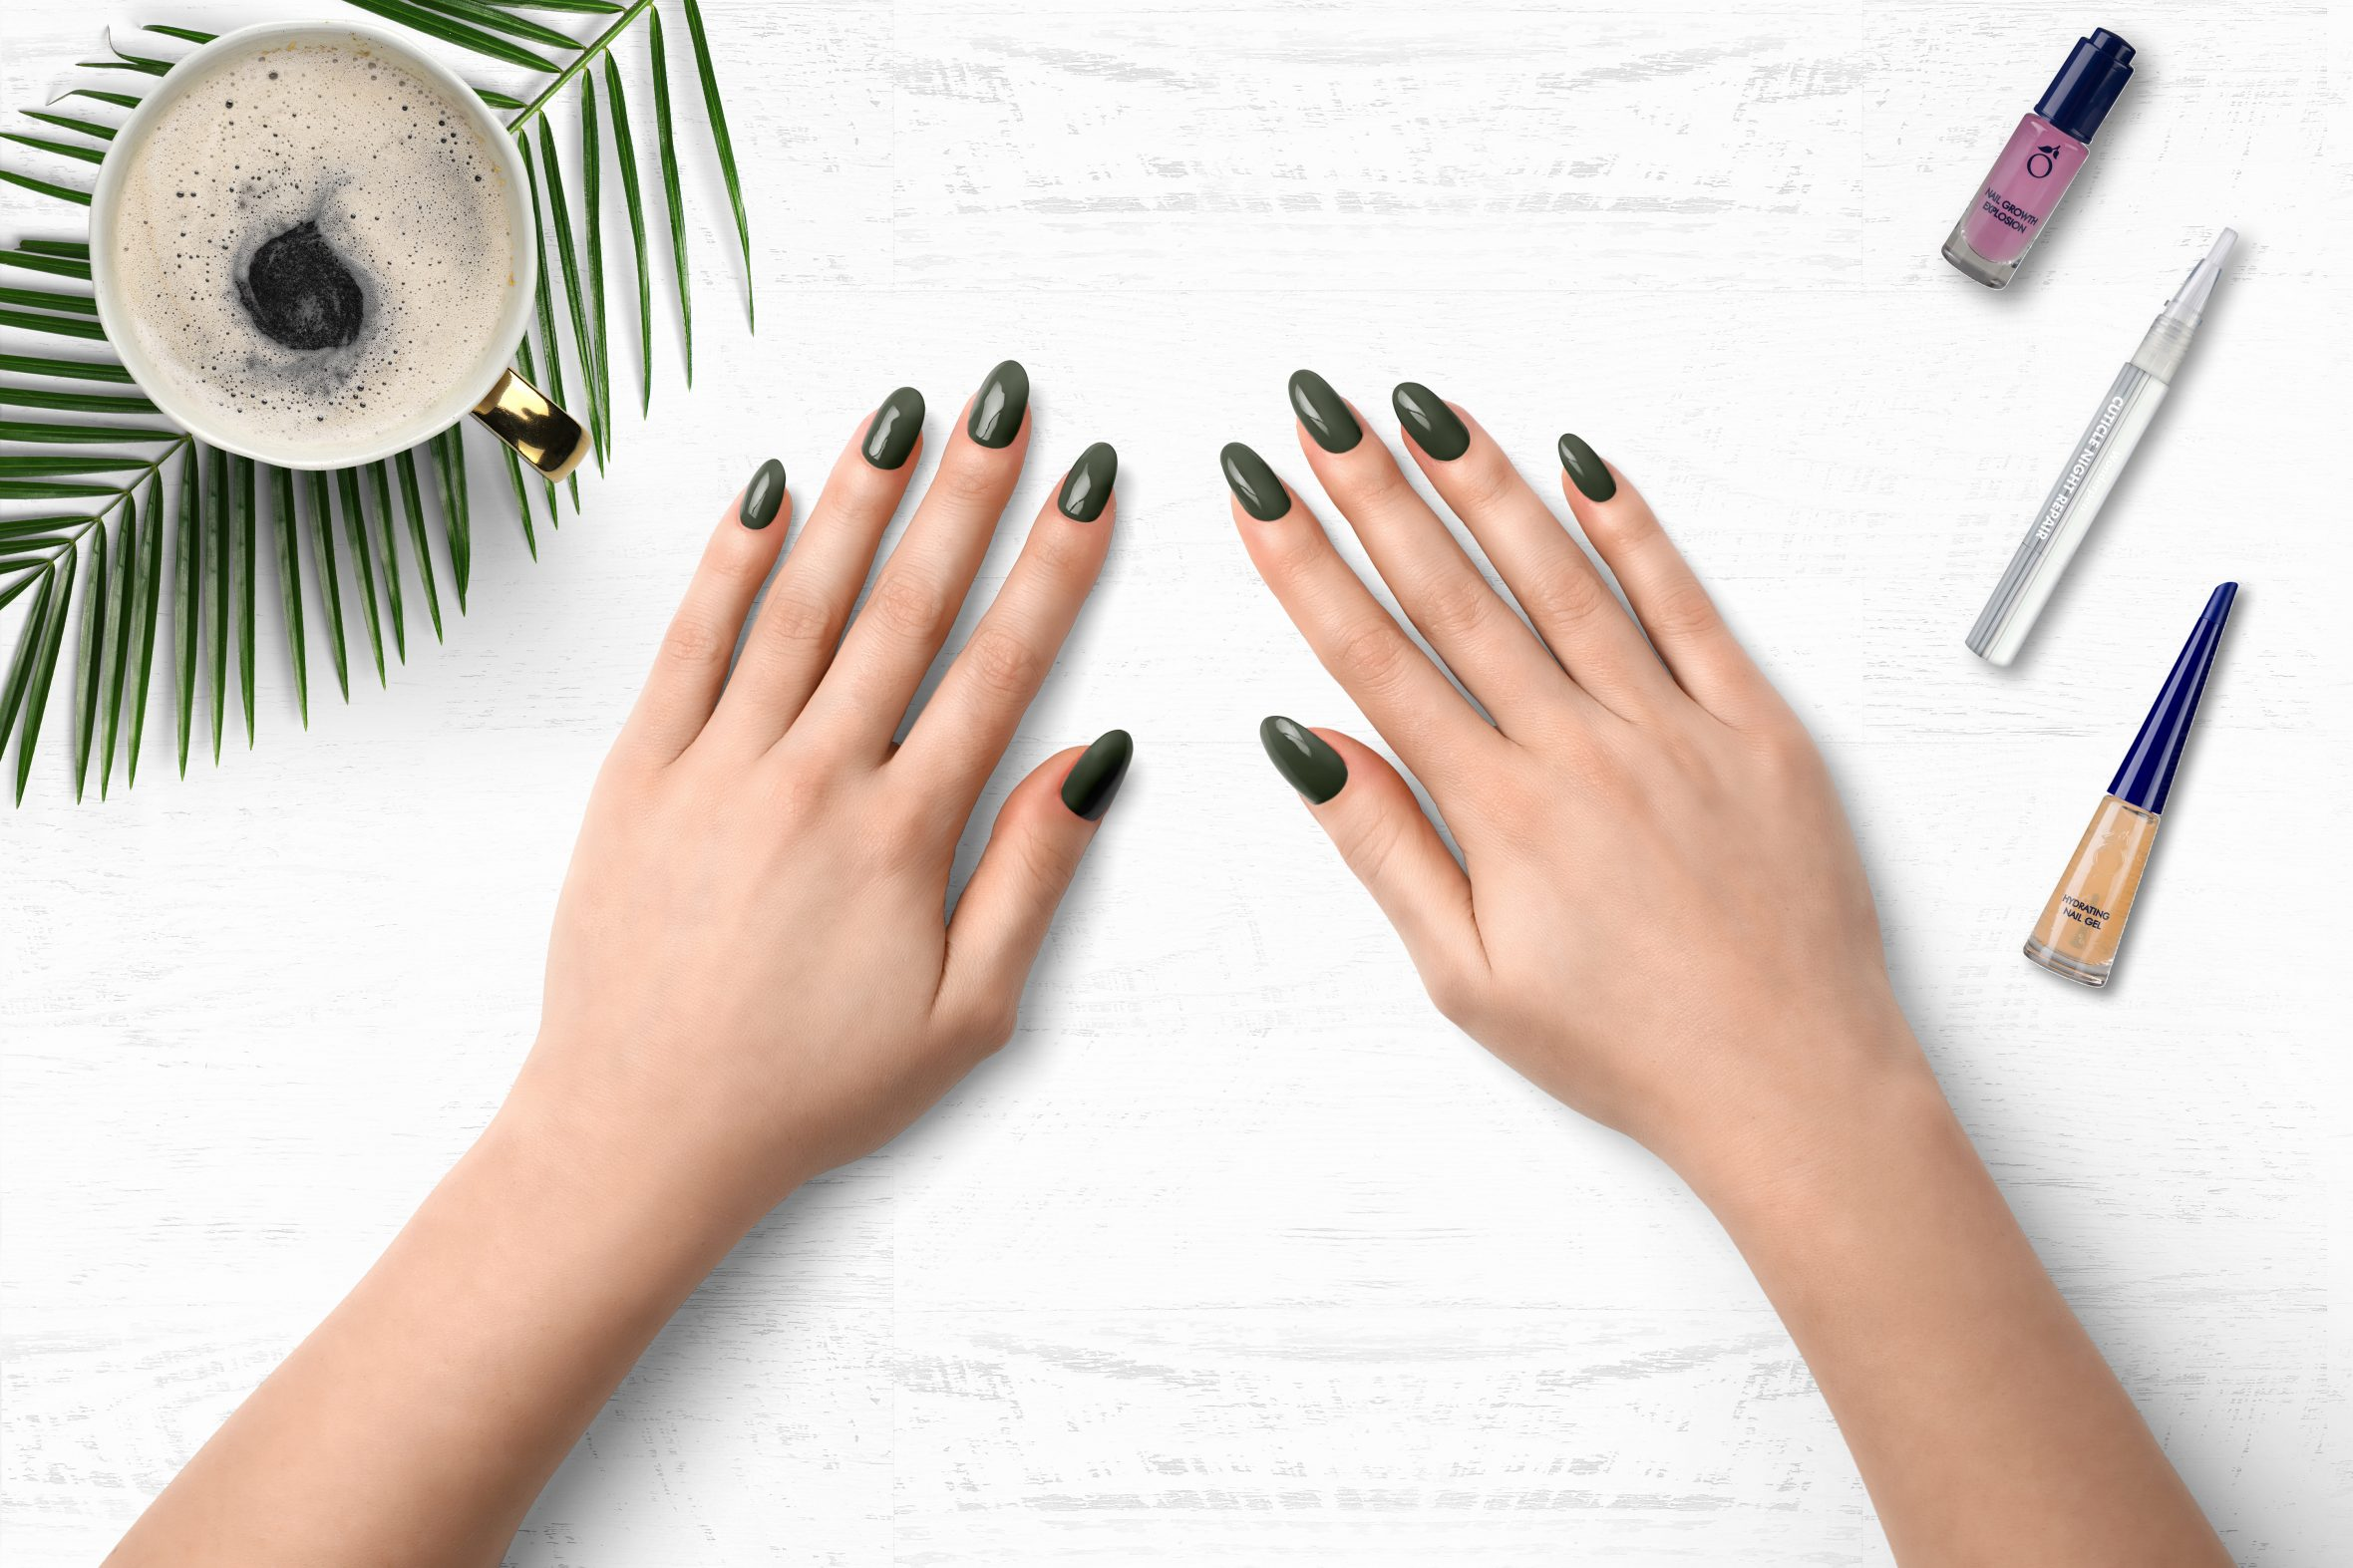 Metallic nagellak kleurnummer 181 van de Herôme nagellak kleuren